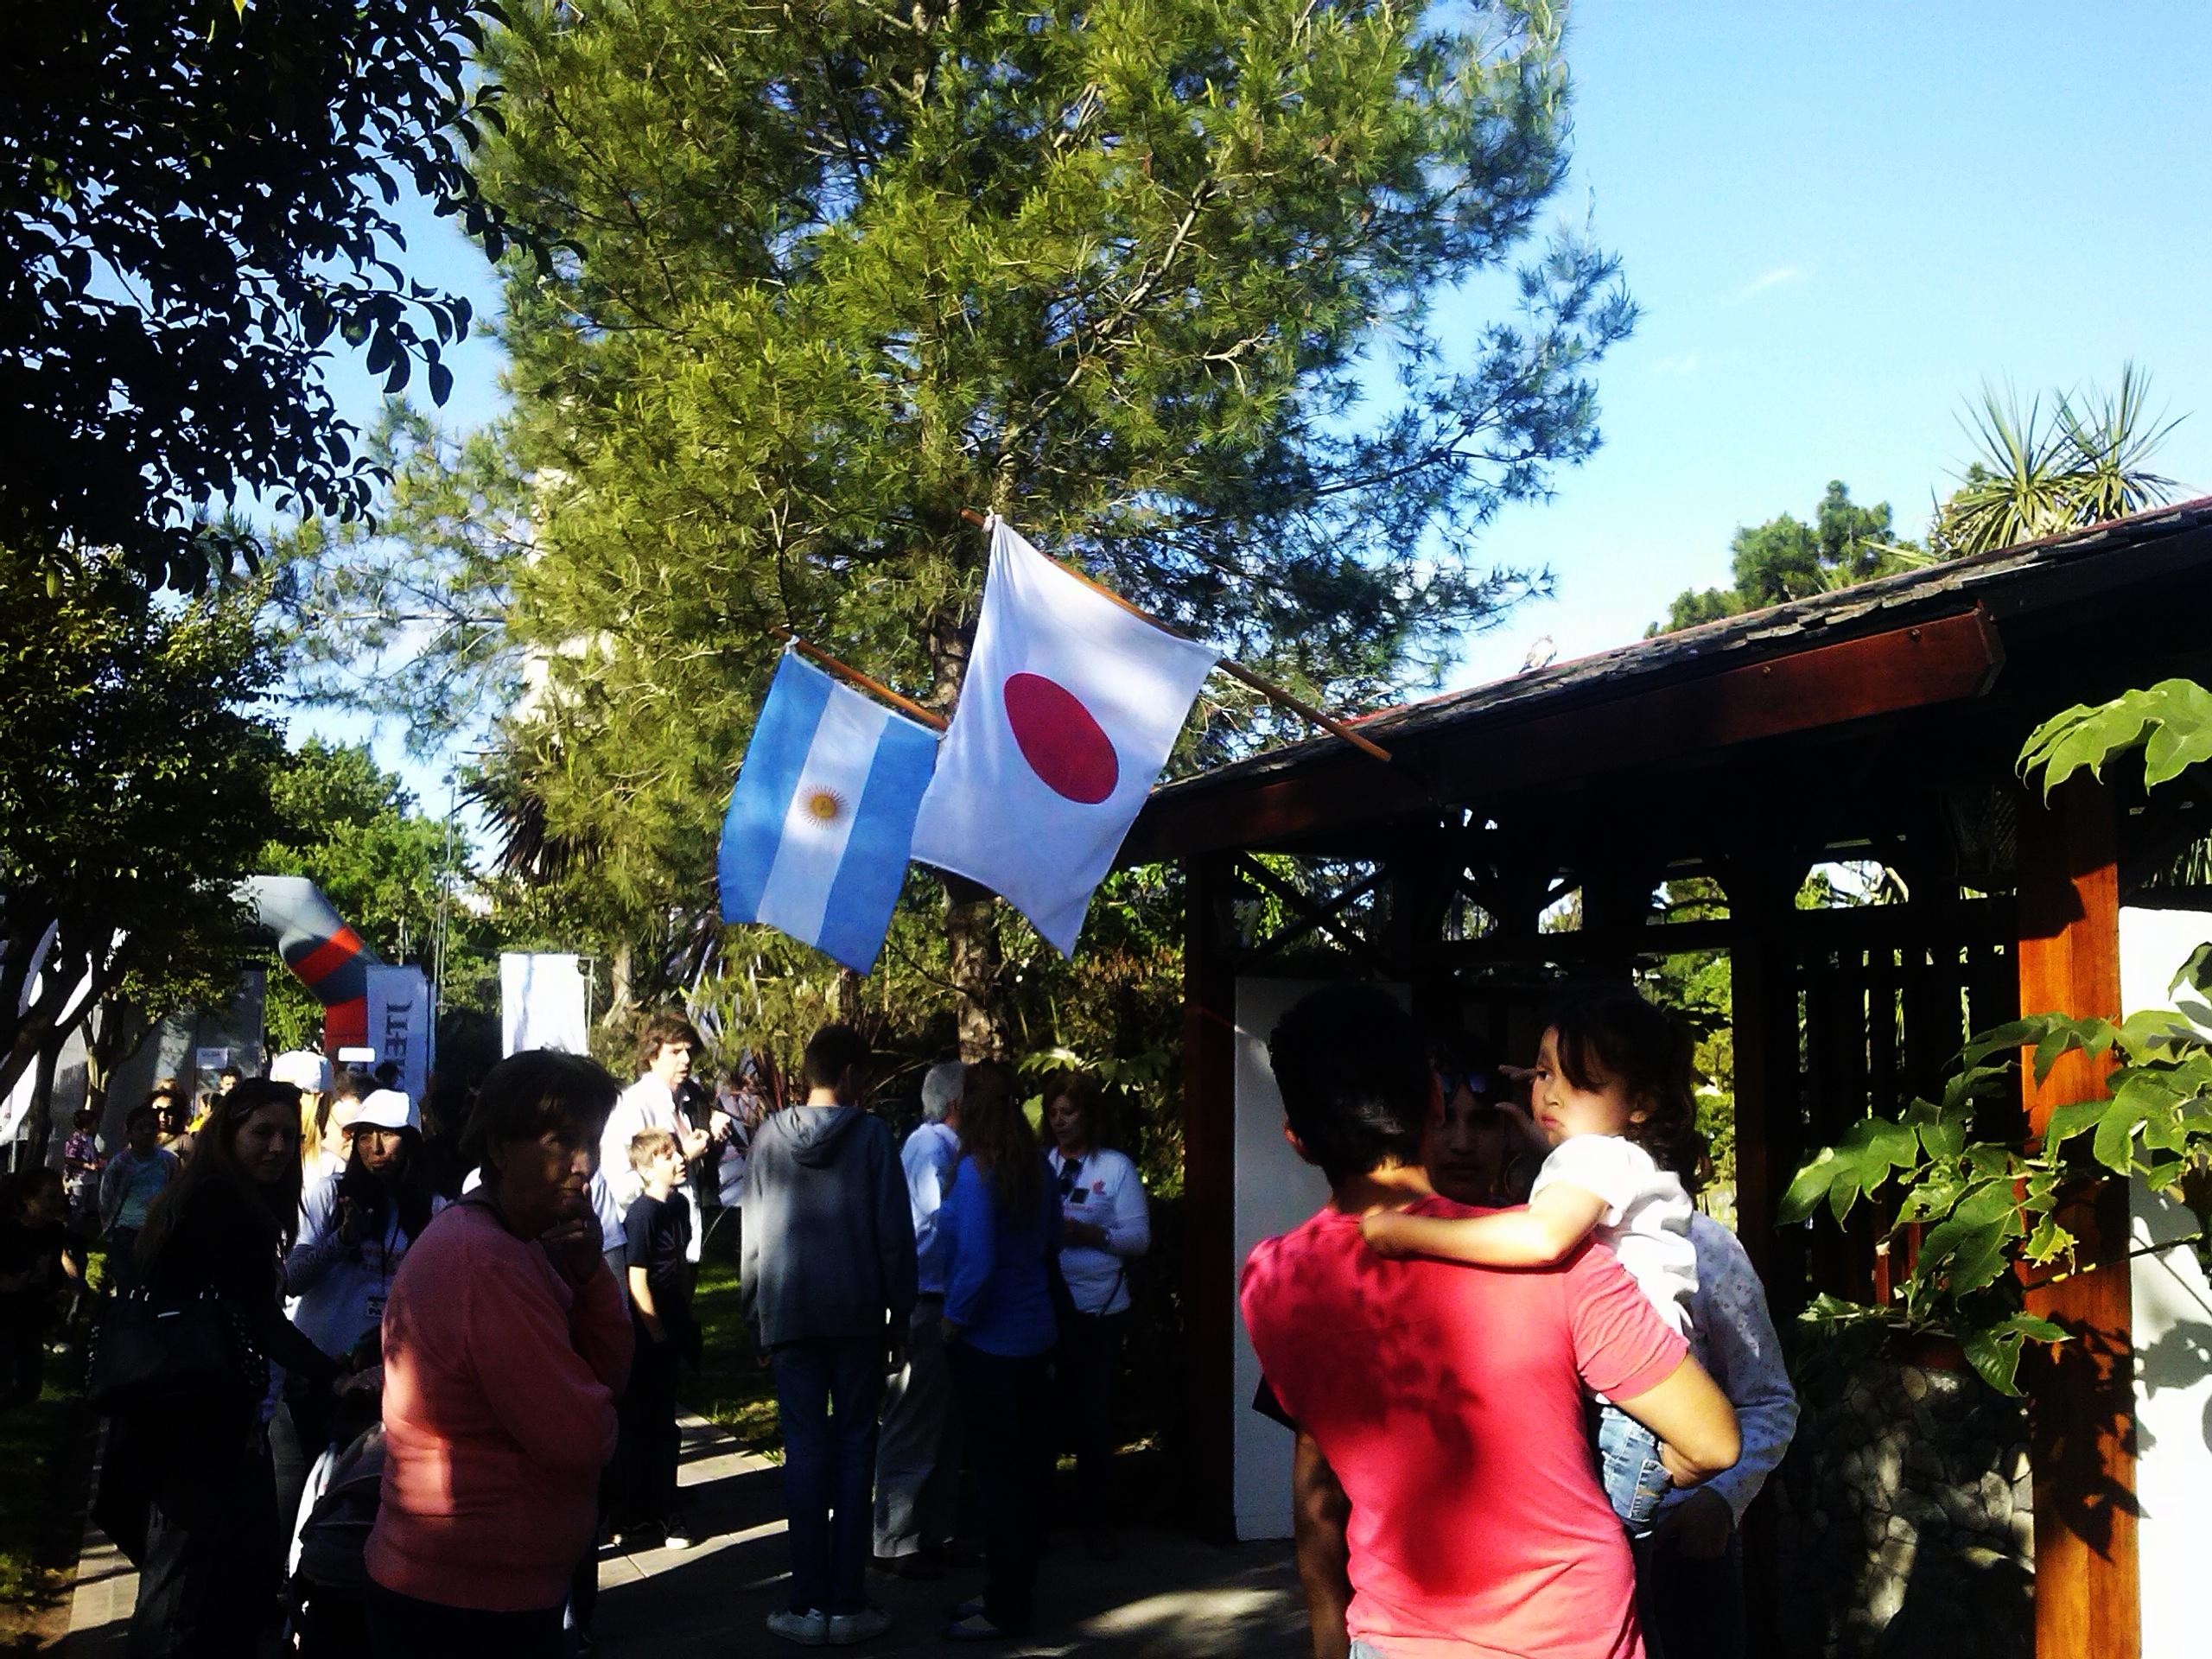 File entrada jardin japones wikimedia commons for Jardin japones de escobar